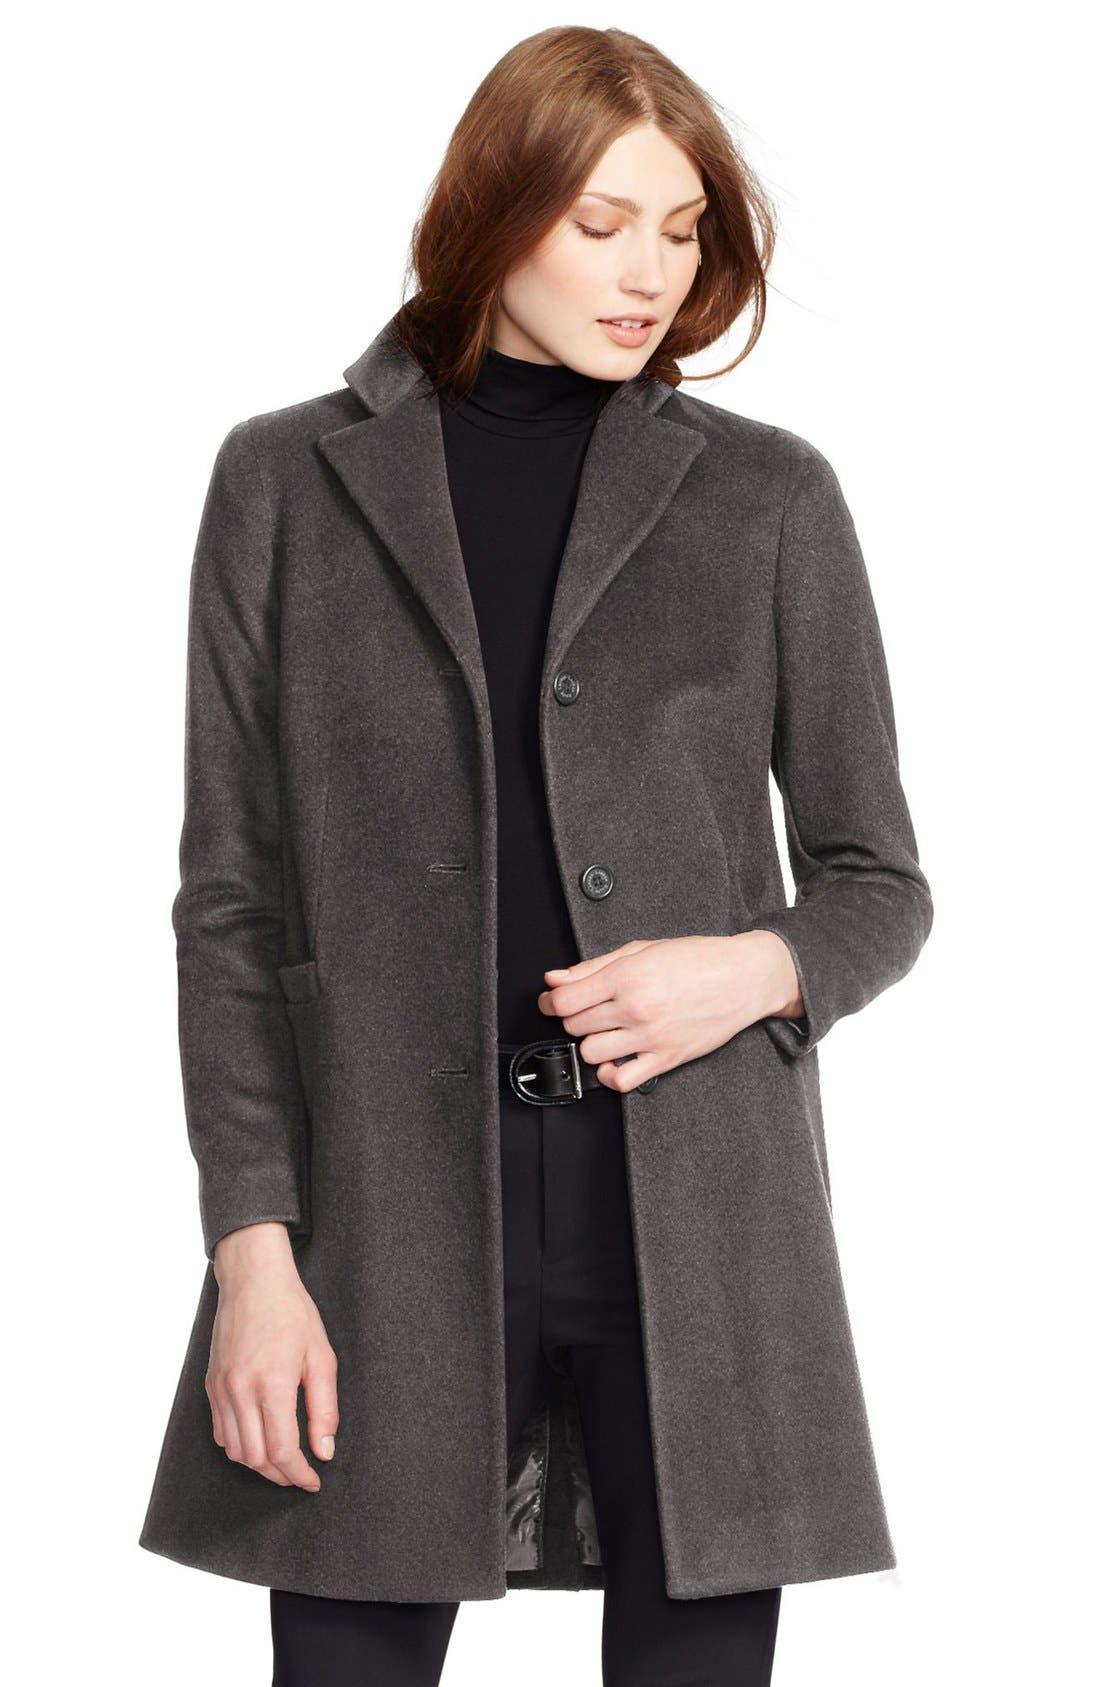 Alternate Image 1 Selected - Lauren Ralph Lauren Wool Blend Reefer Coat (Regular & Petite)